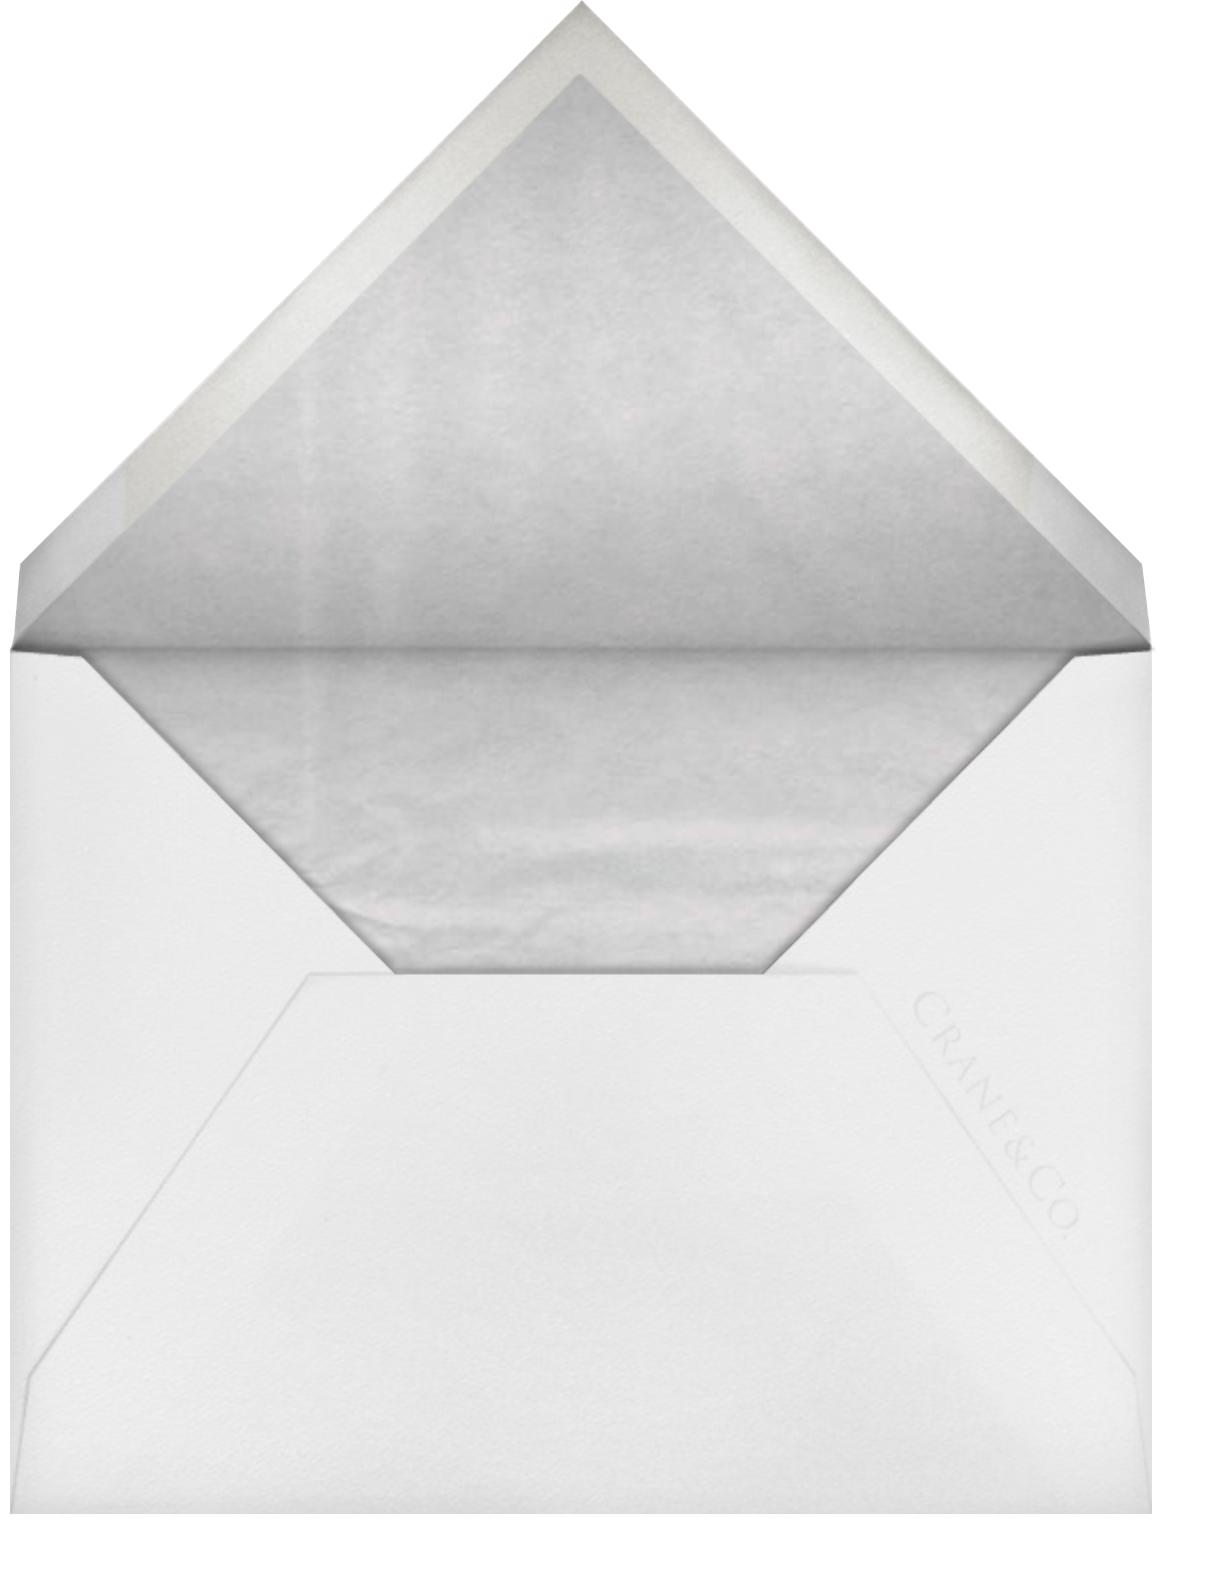 Amande - Newport Blue - Paperless Post - Baby naming and bris - envelope back